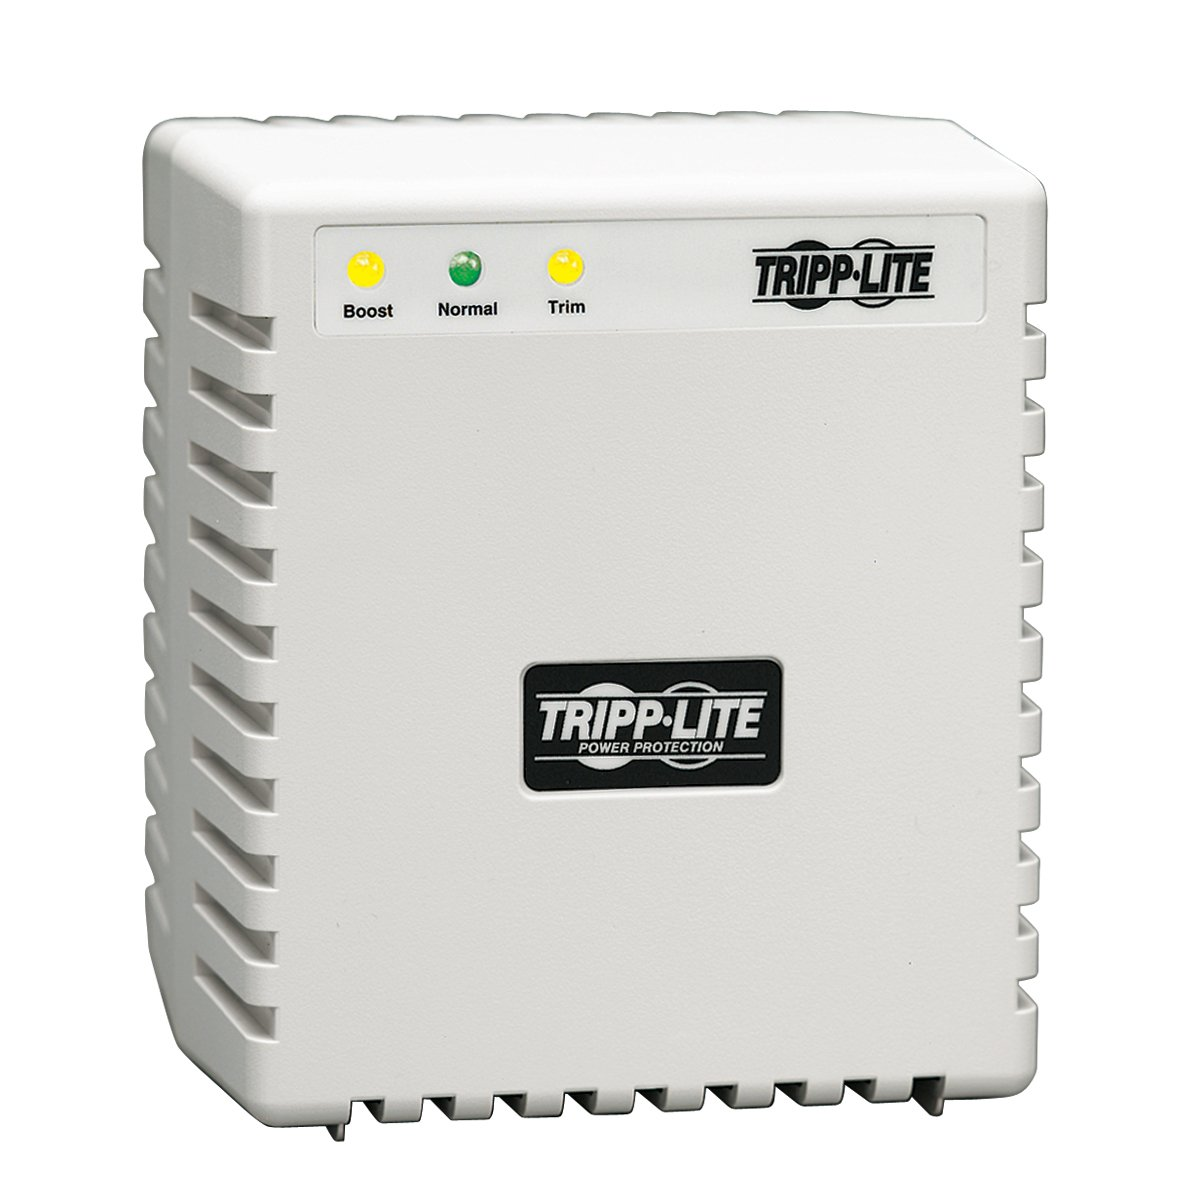 Tripp Lite LR604 Line Conditioner 600W AVR Surge 230V 2.6A 50/60Hz C13 3 Outlet